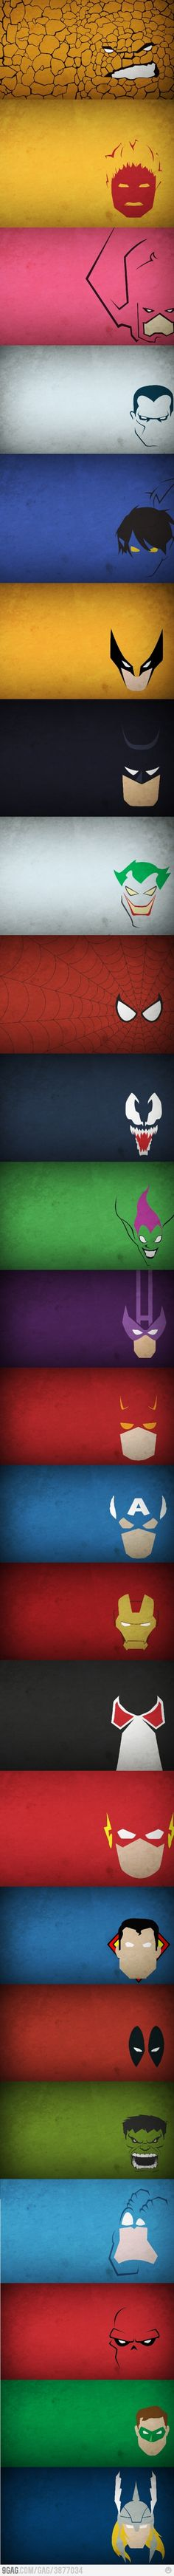 The Thing, Human Torch, Galactus, ?, Night Crawler, Wolverine, Batman, Joker, Spiderman, Venom, Green Goblin, Hawkeye, Dare Devil, Captain America, Iron Man, ?, The Flash, Superman, Dead Pool, The Hulk, ?, Red Skull, Green Lantern, and Thor